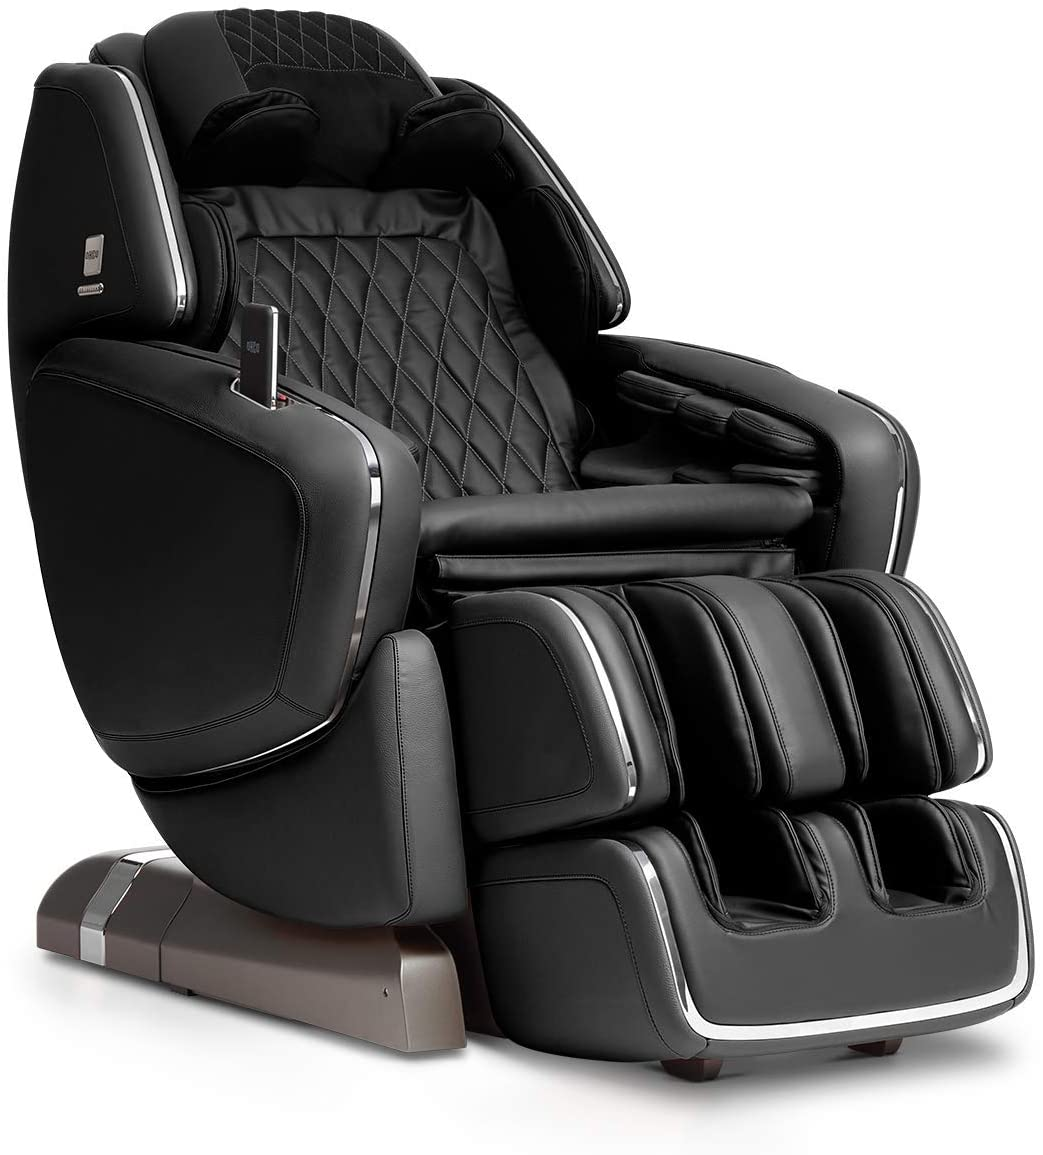 ohco m8 massage chair in black